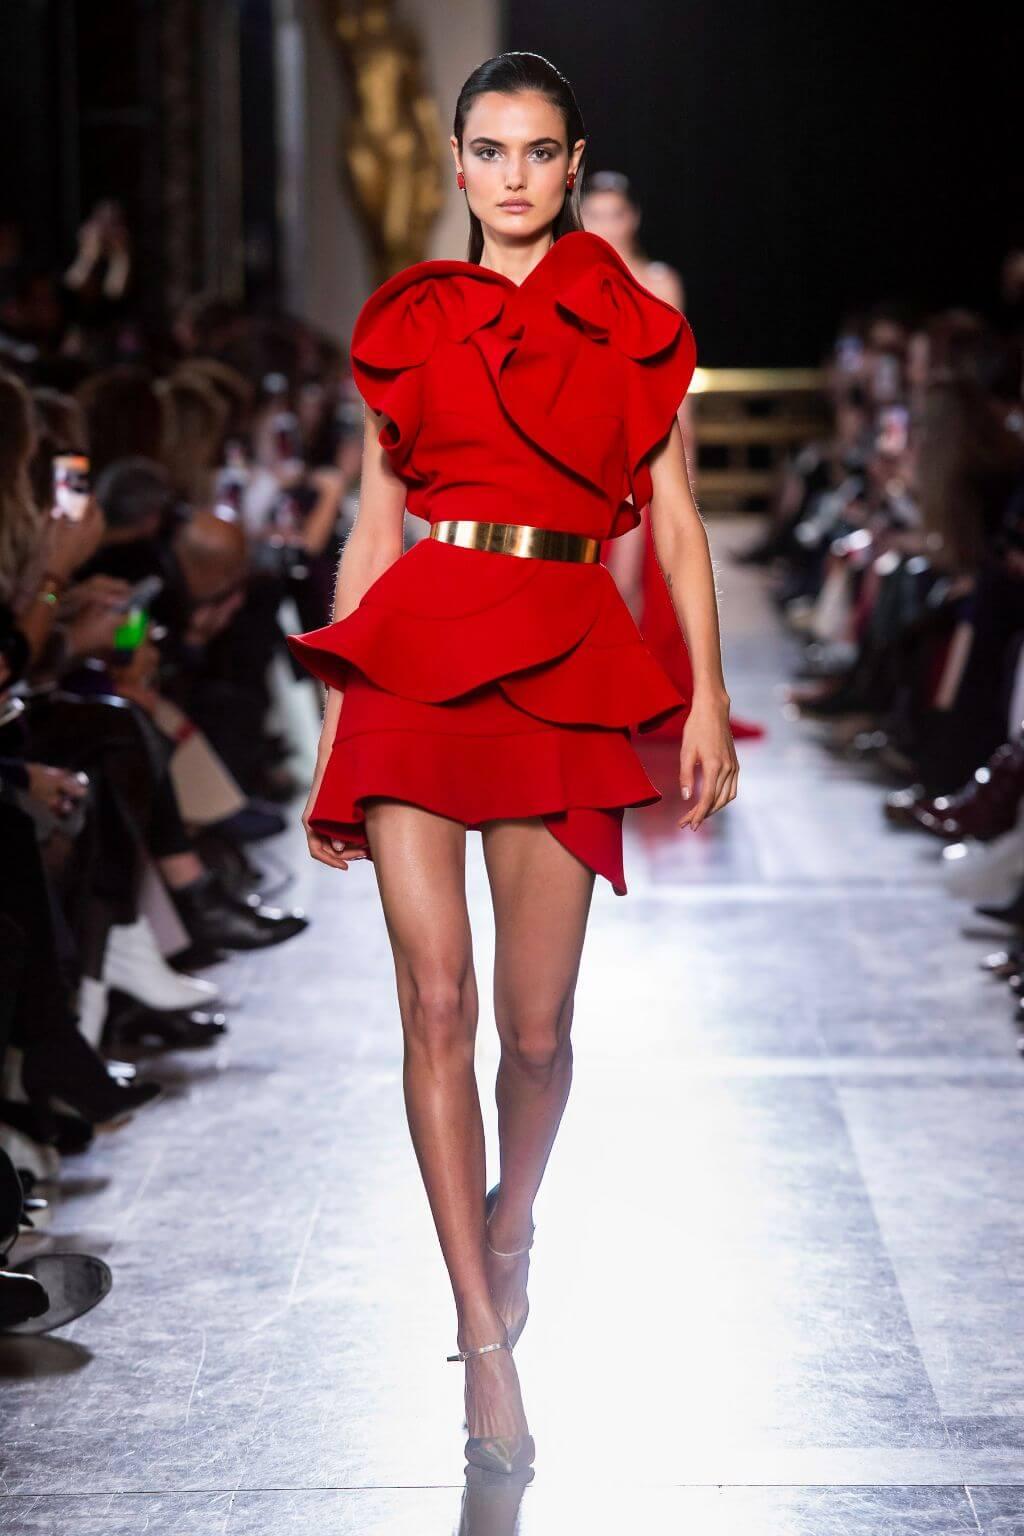 Elie Saab Couture Spring Summer 2019 01